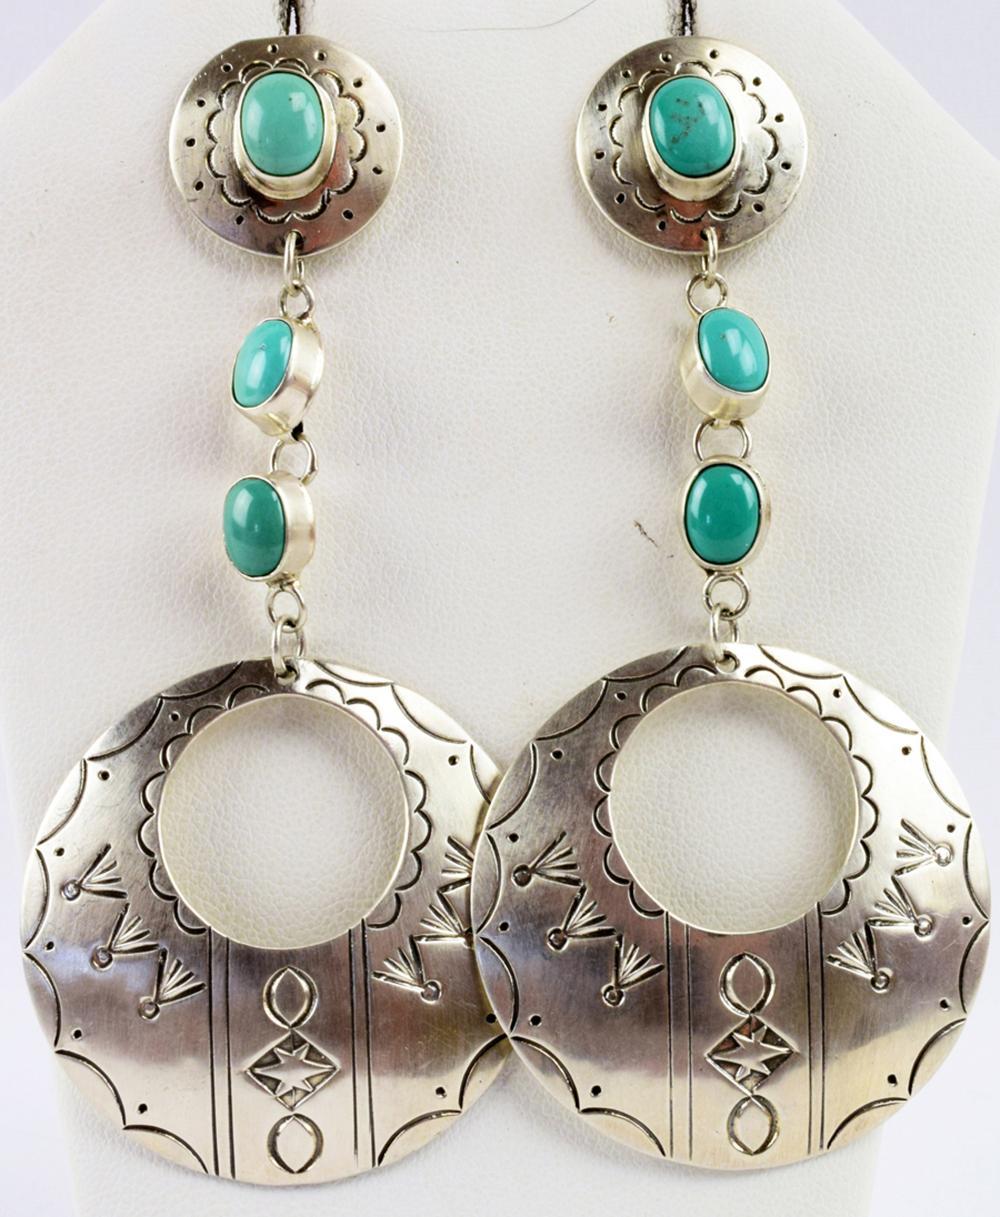 Navajo Sterling Silver Long Earrings w/Turquoise